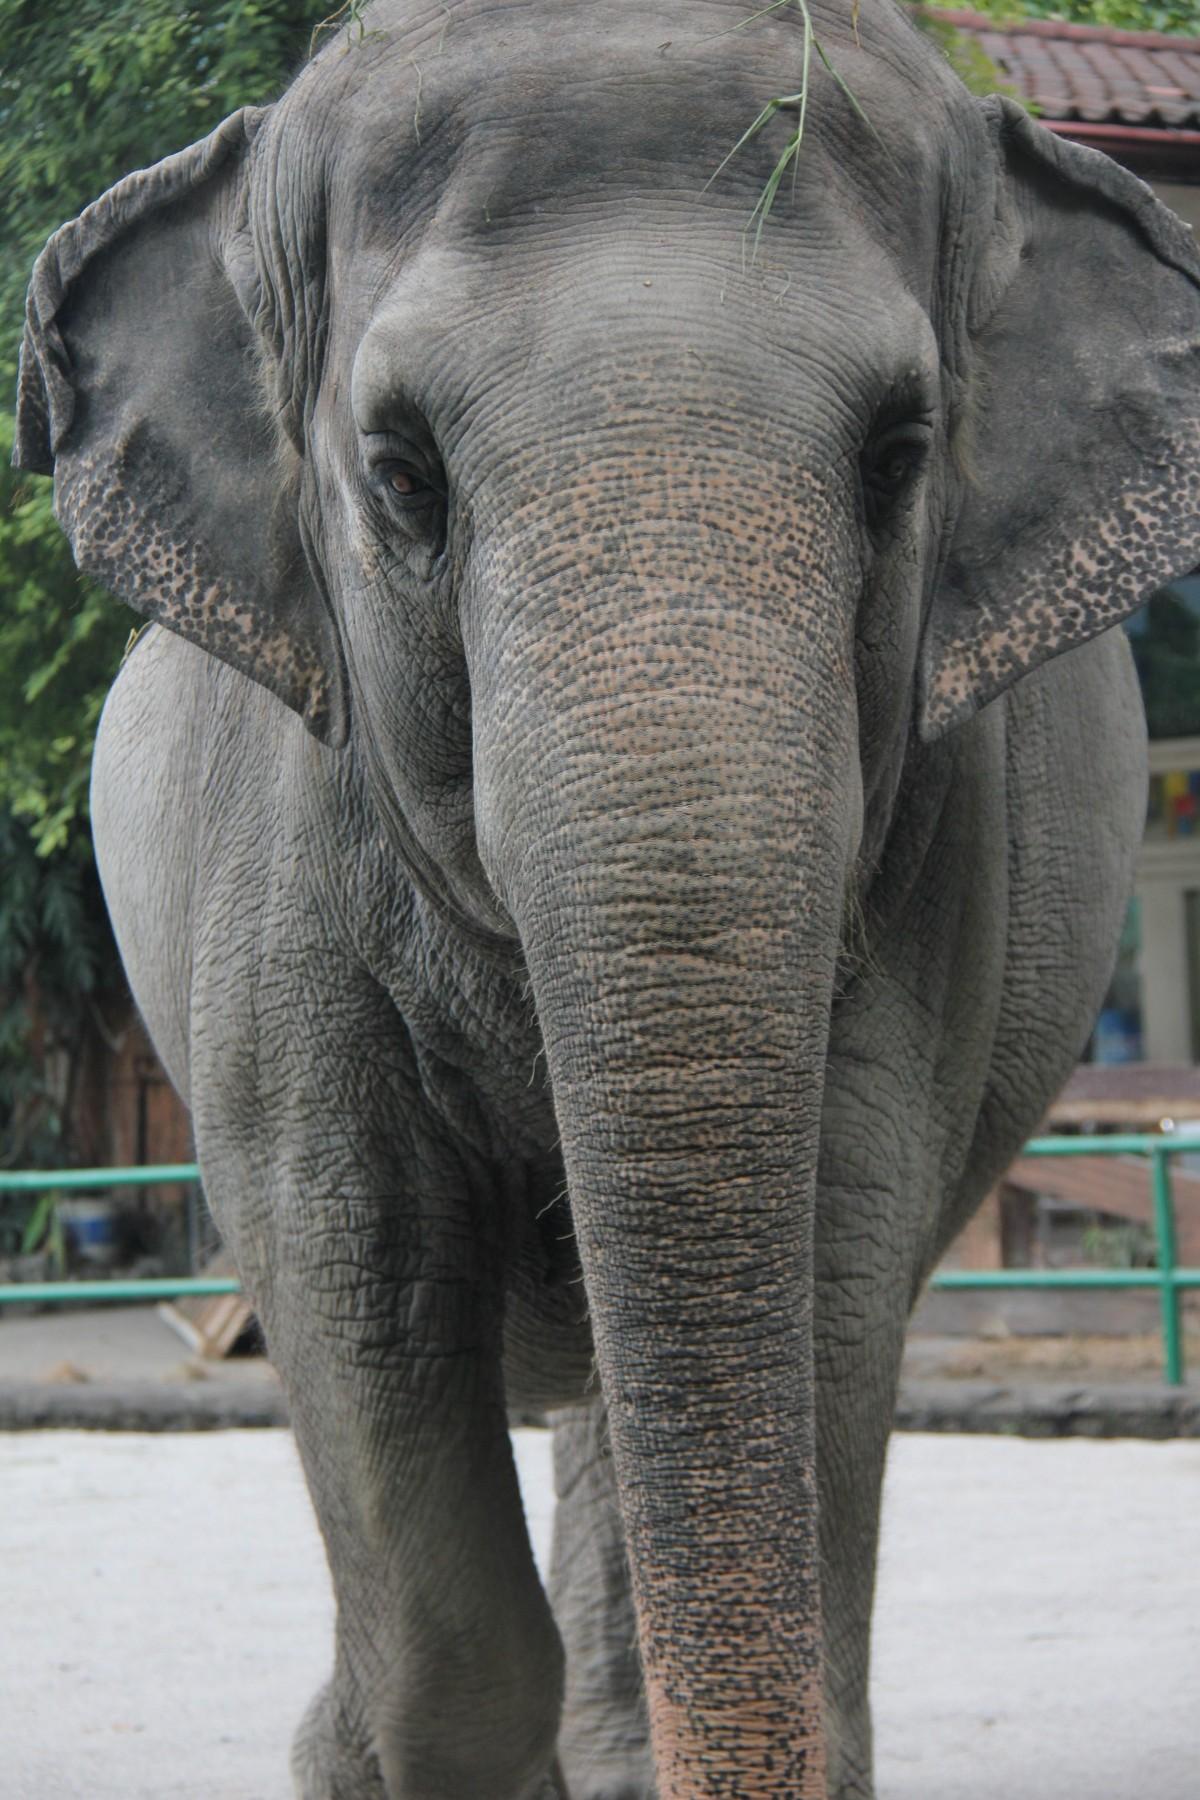 Mali at the Manila Zoo